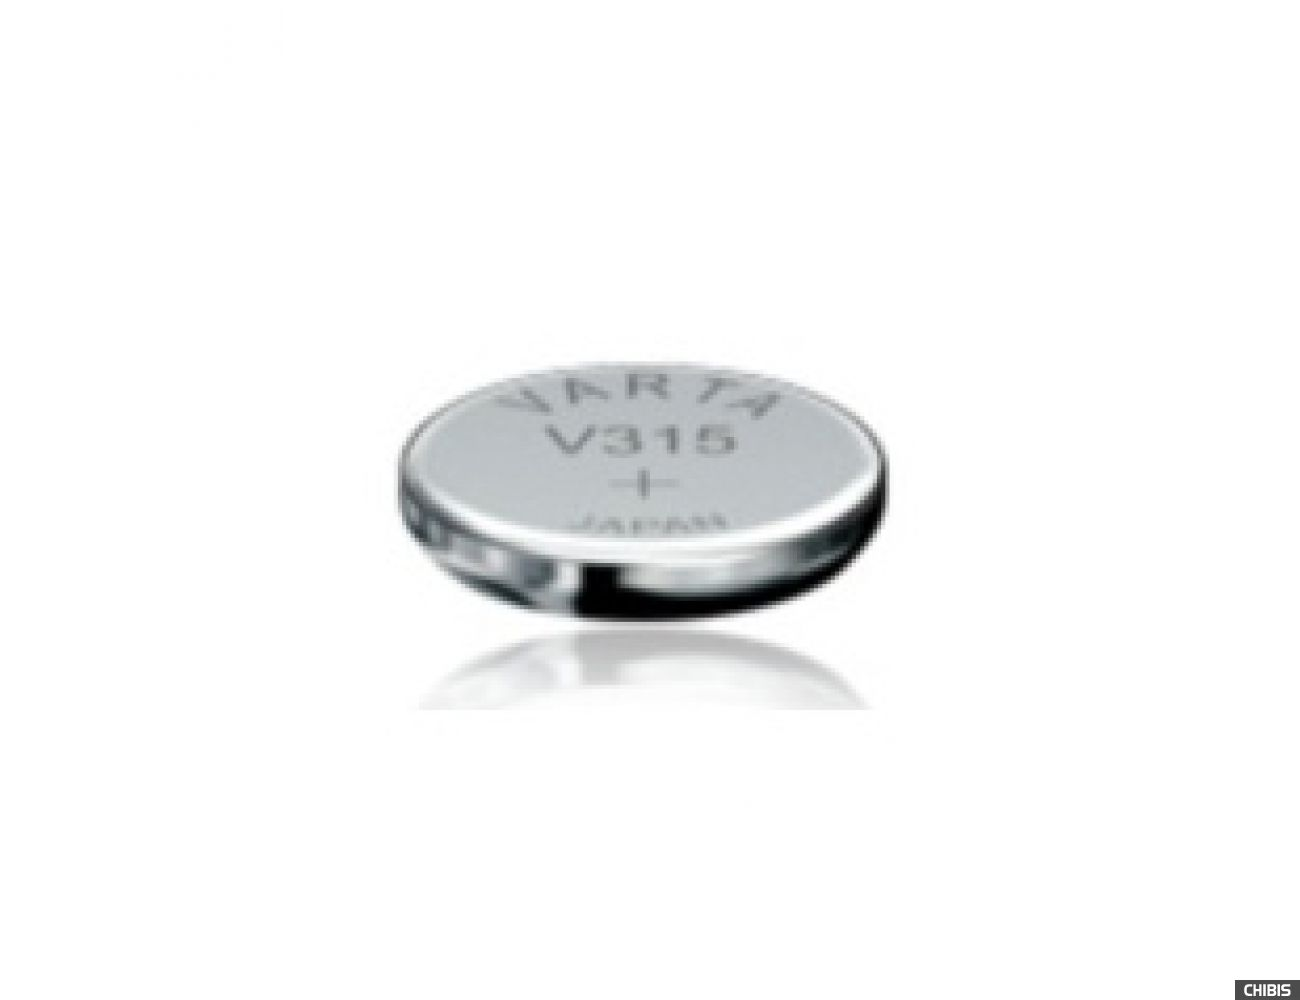 Батарейка Varta V315 (SR67, 20mAh, 1.55V, Оксид Серебра) 00315101111